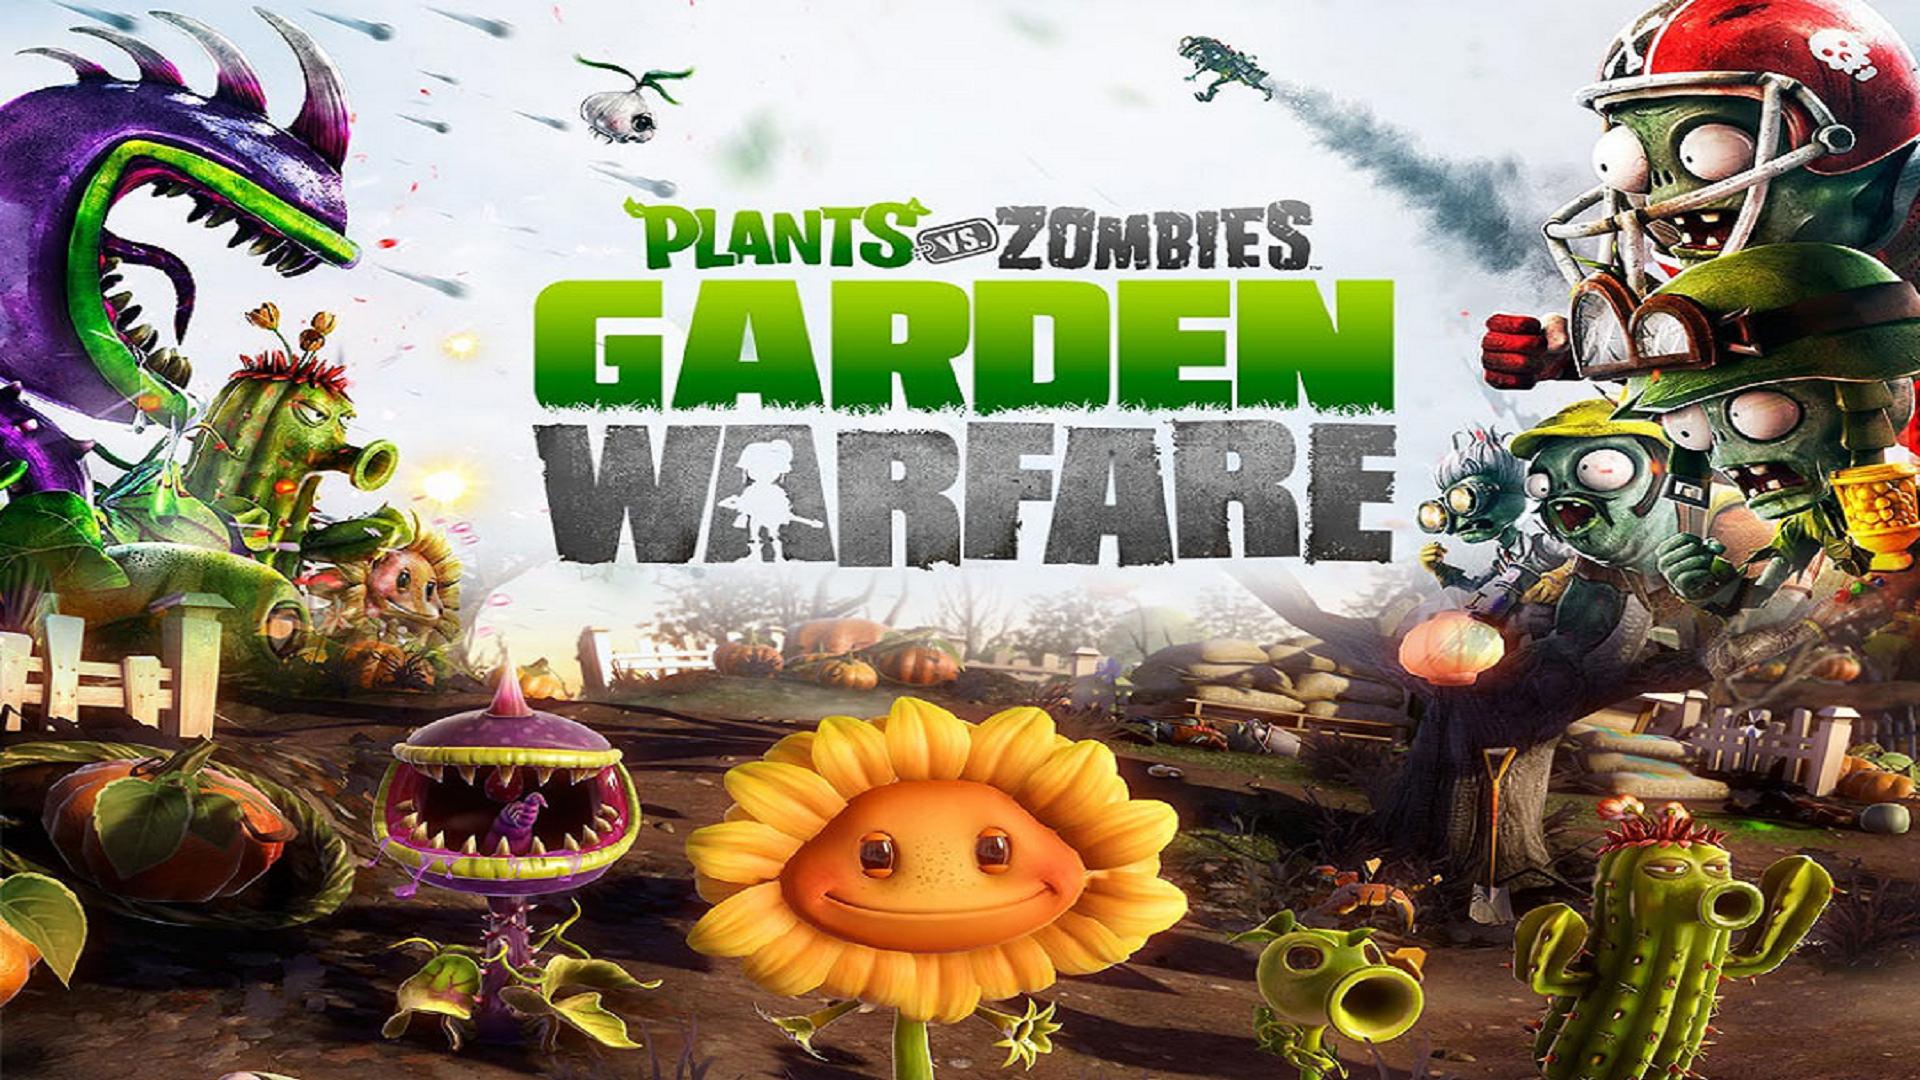 Pvz garden warfare 2 wallpaper wallpapersafari Plants vs zombies garden warfare 2 event calendar